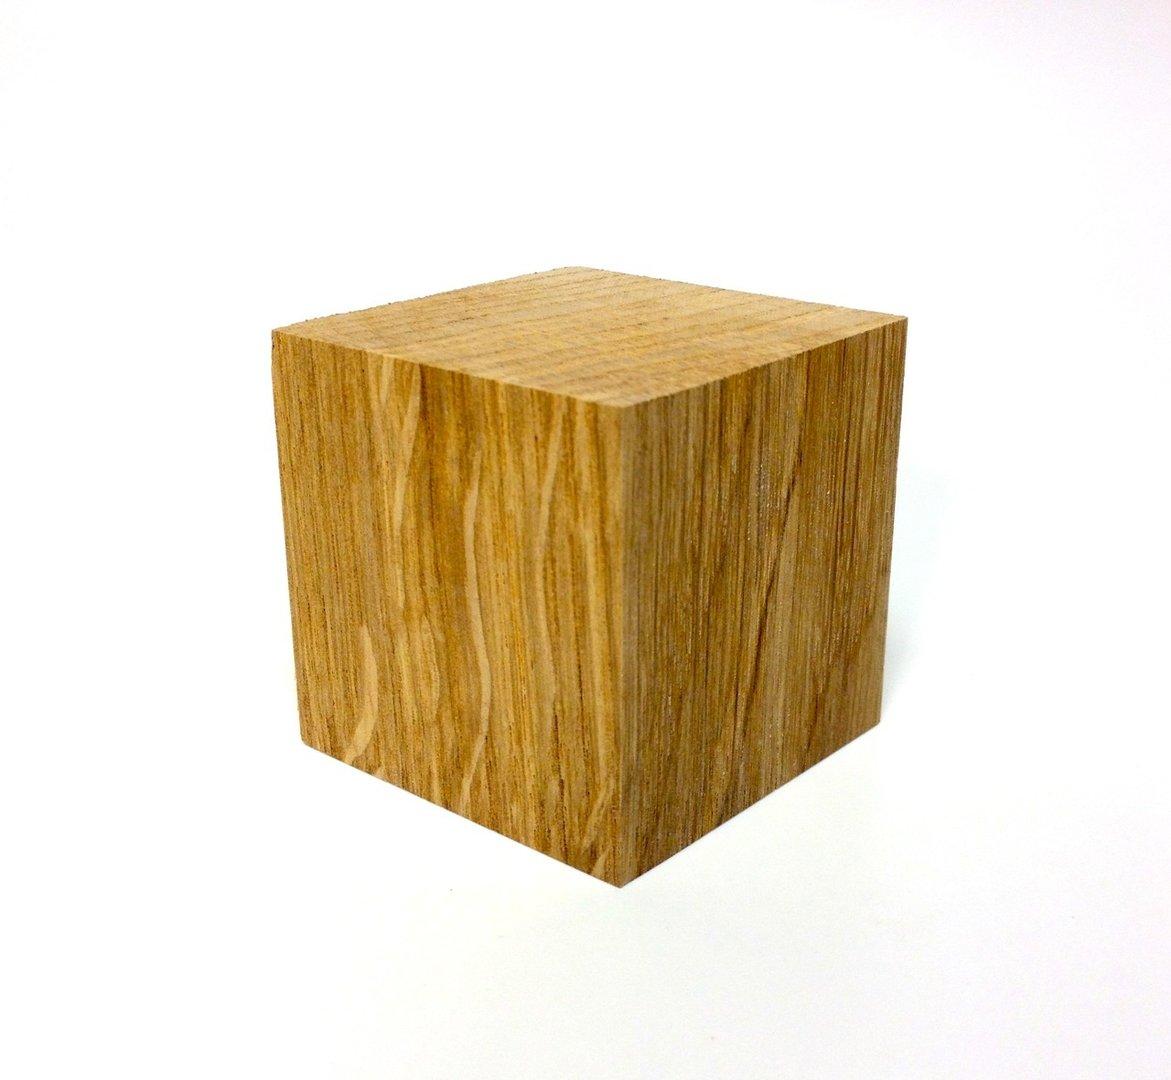 holzw rfel eiche 40x40x40mm. Black Bedroom Furniture Sets. Home Design Ideas